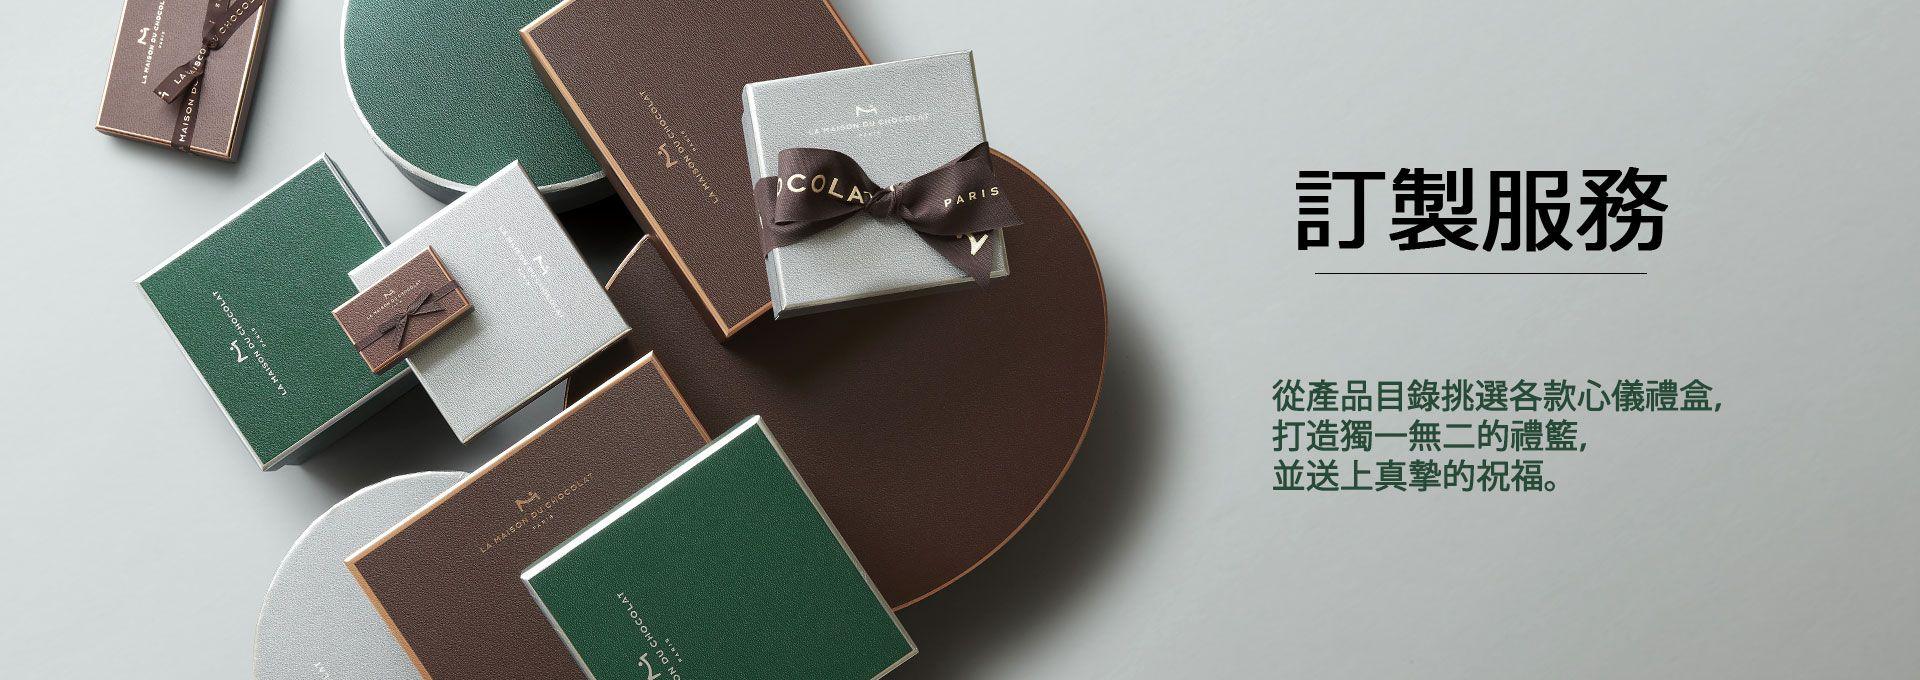 訂製服務 - La Maison du Chocolat